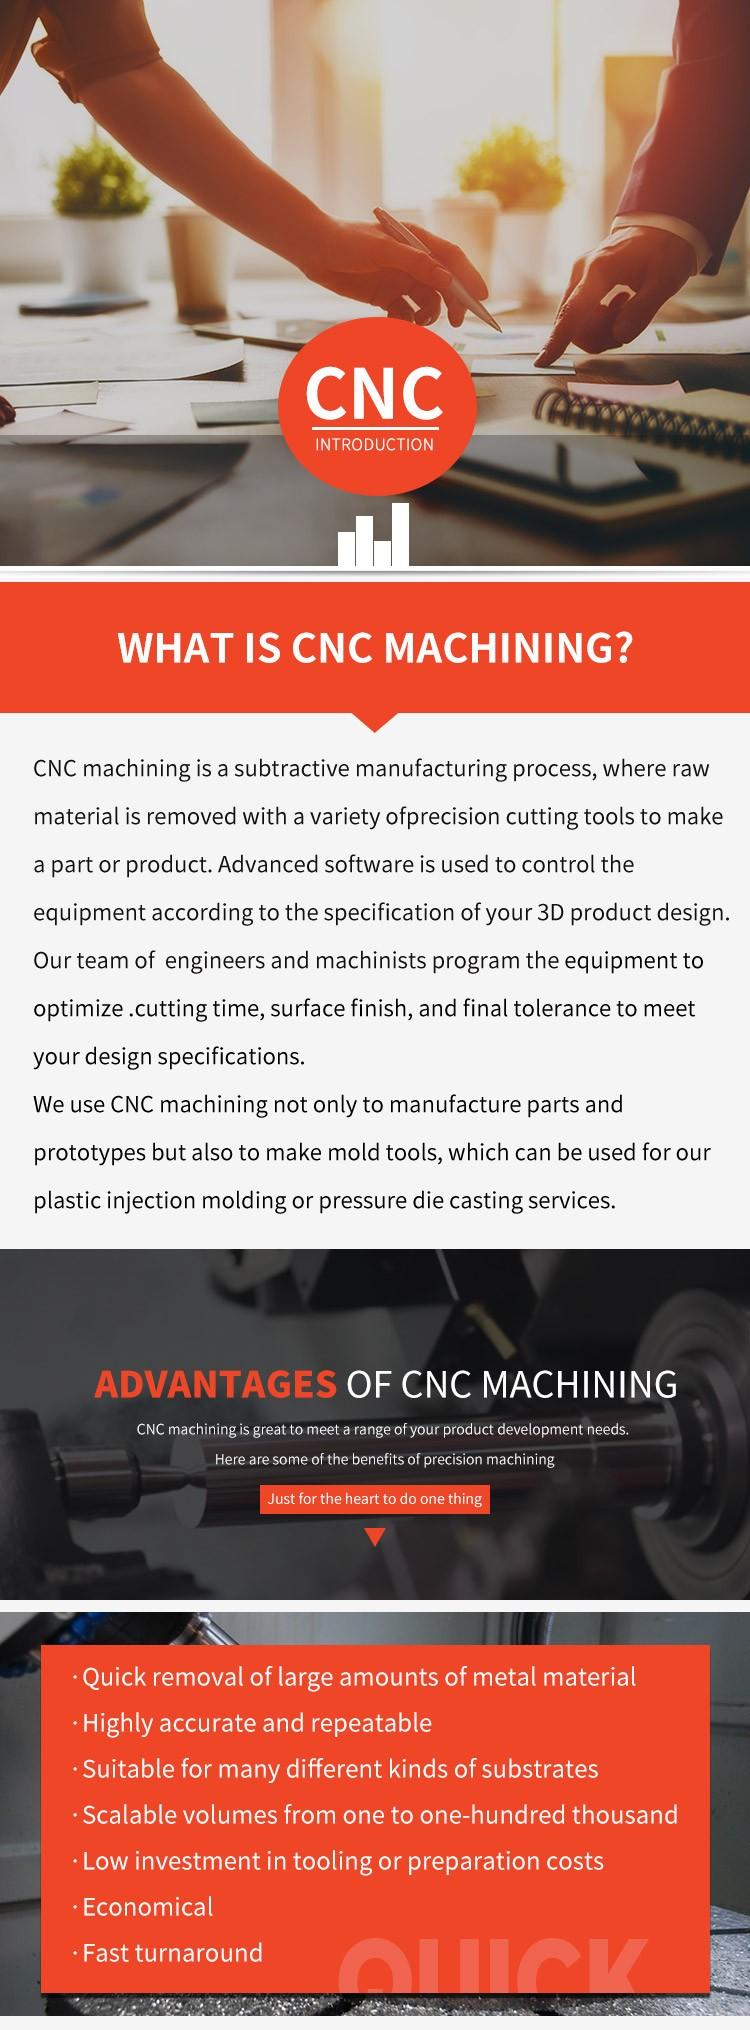 3d rapid prototype cnc metal parts in Guangzhou